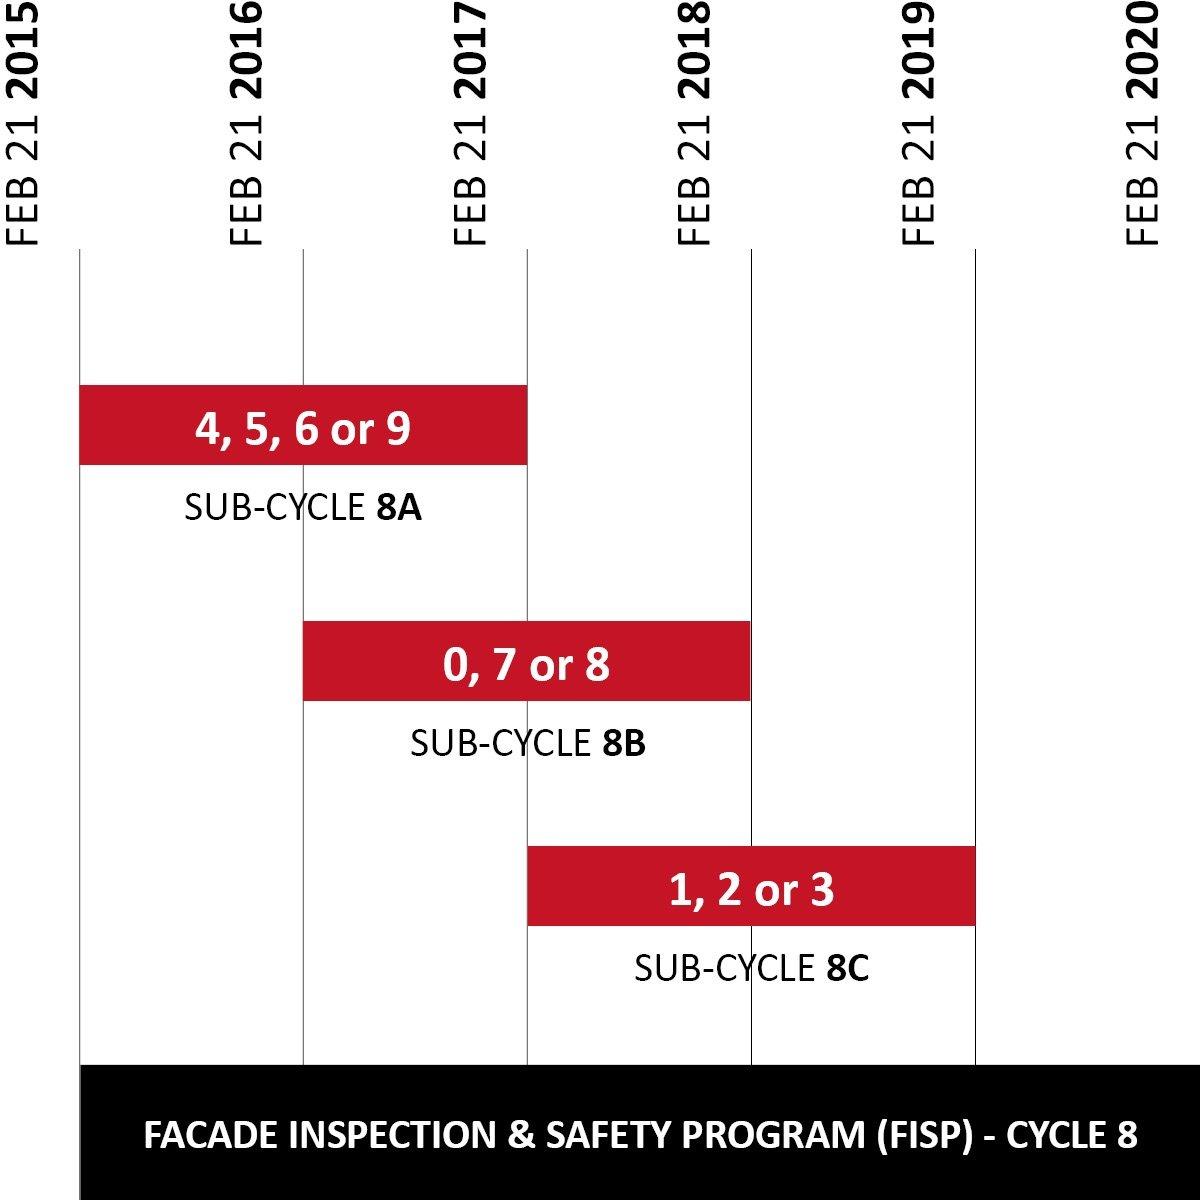 FISP_Cycle_8_Graphic_2-1.jpg